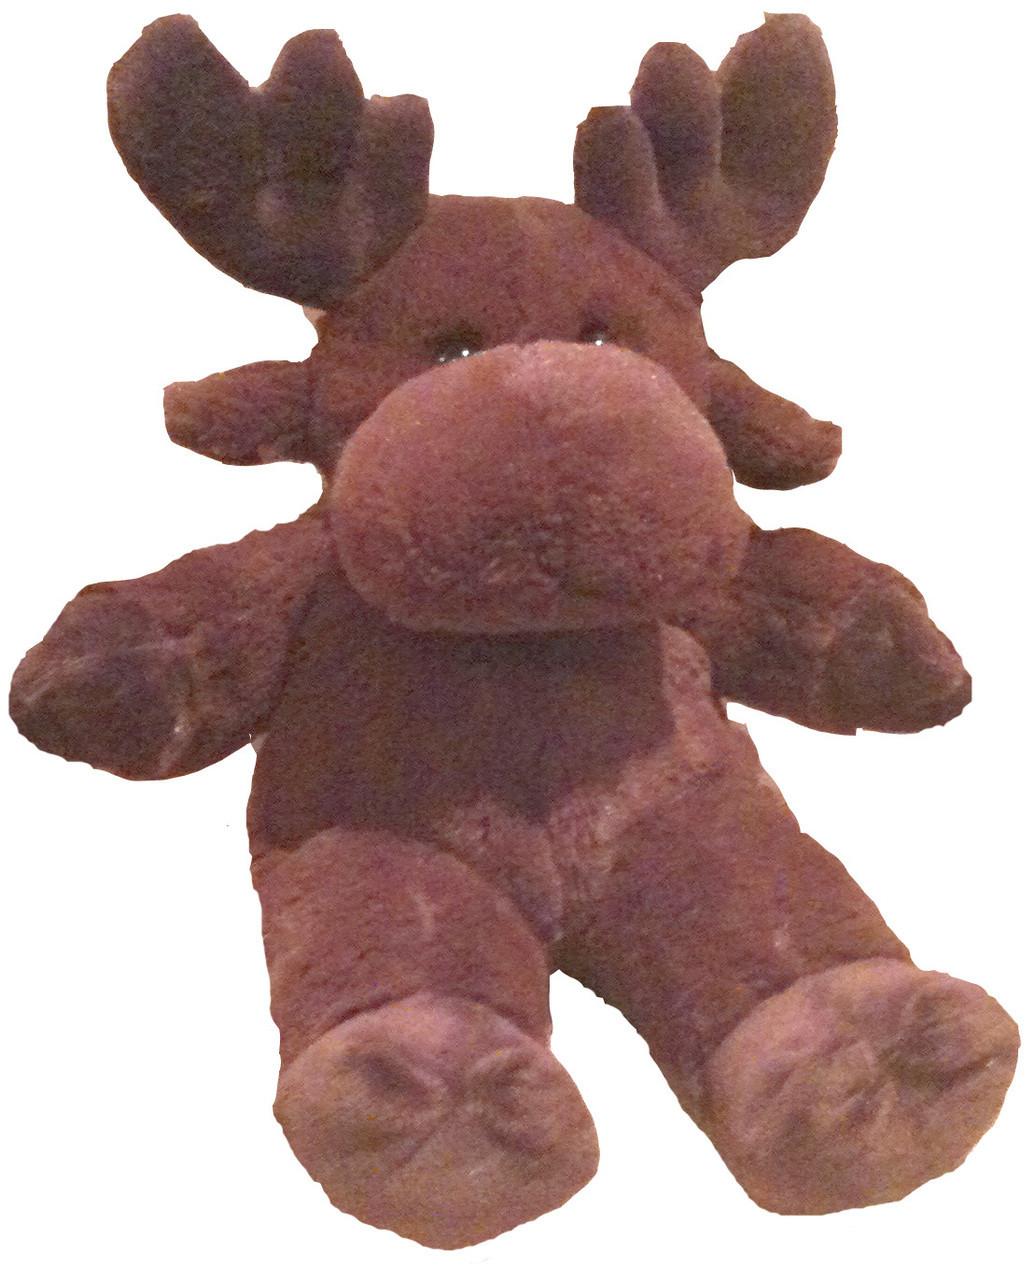 Stuffed Moose Moose Stuffed Animal Toy Stuffed Moose Head